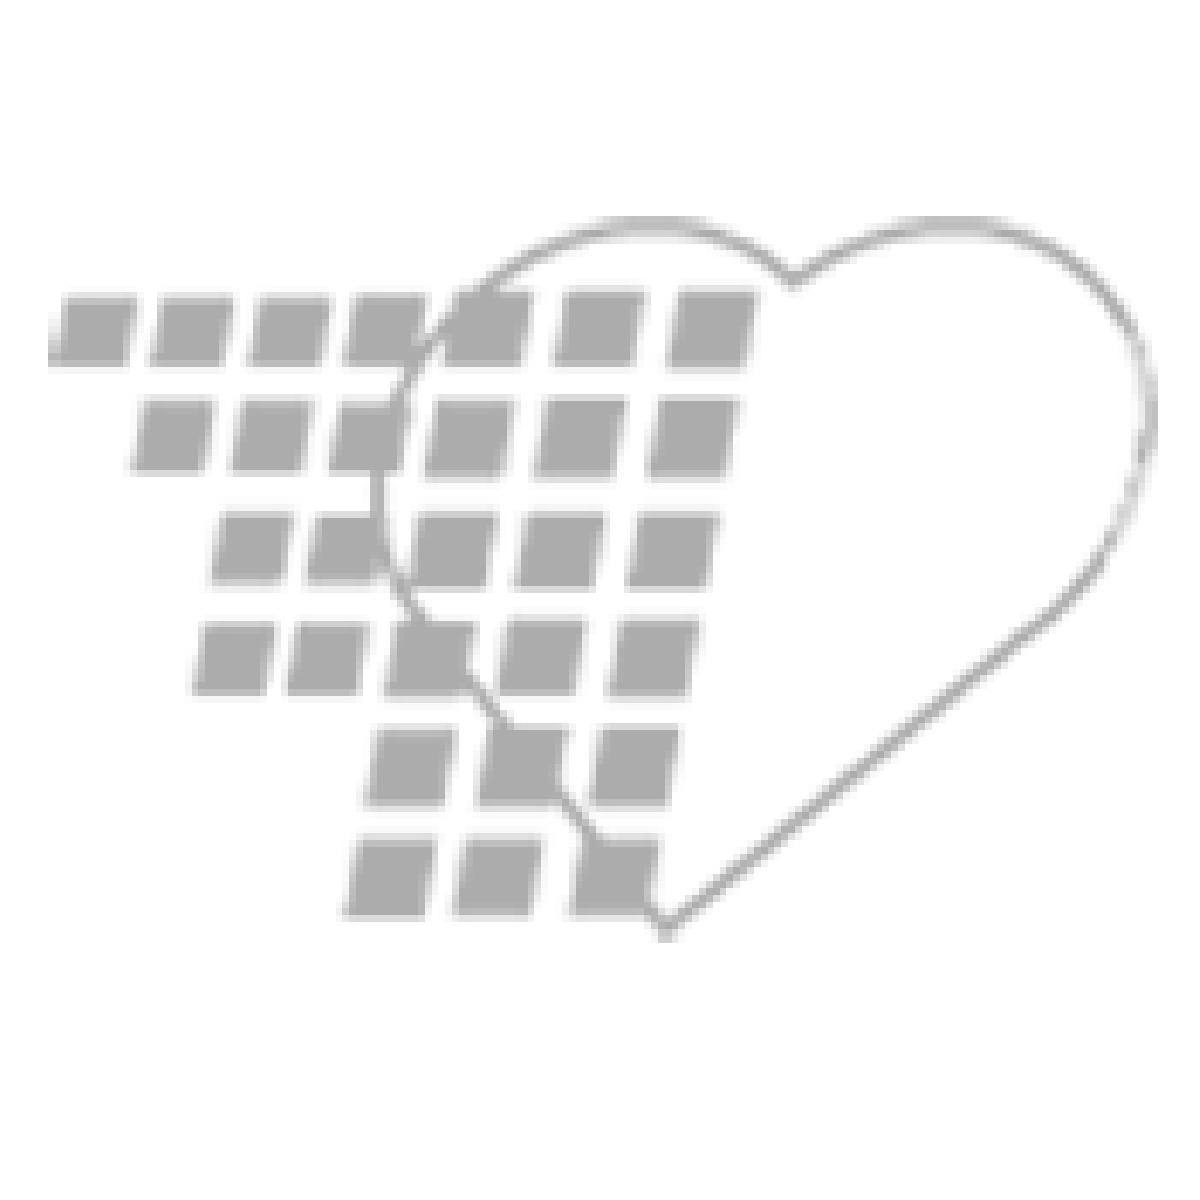 06-93-1030 Demo Dose® Lactatd Ringr's IV Fluid